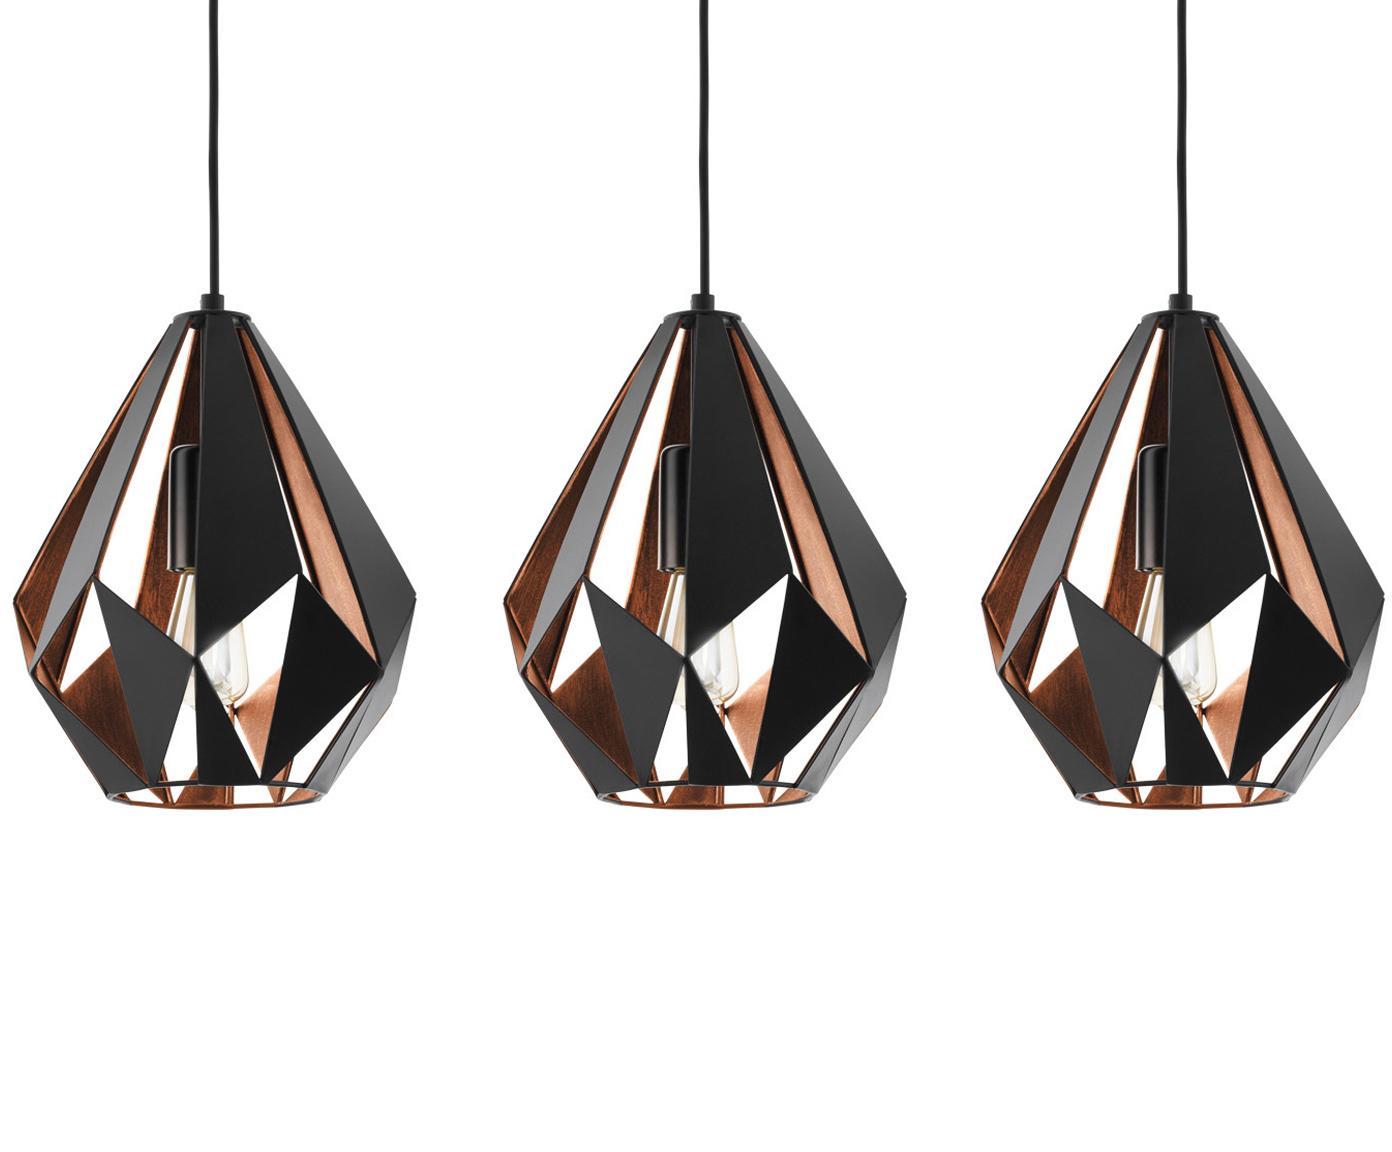 Lampada a sospensione stile nordico Carlton, Nero, Larg. 81 x Alt. 28 cm